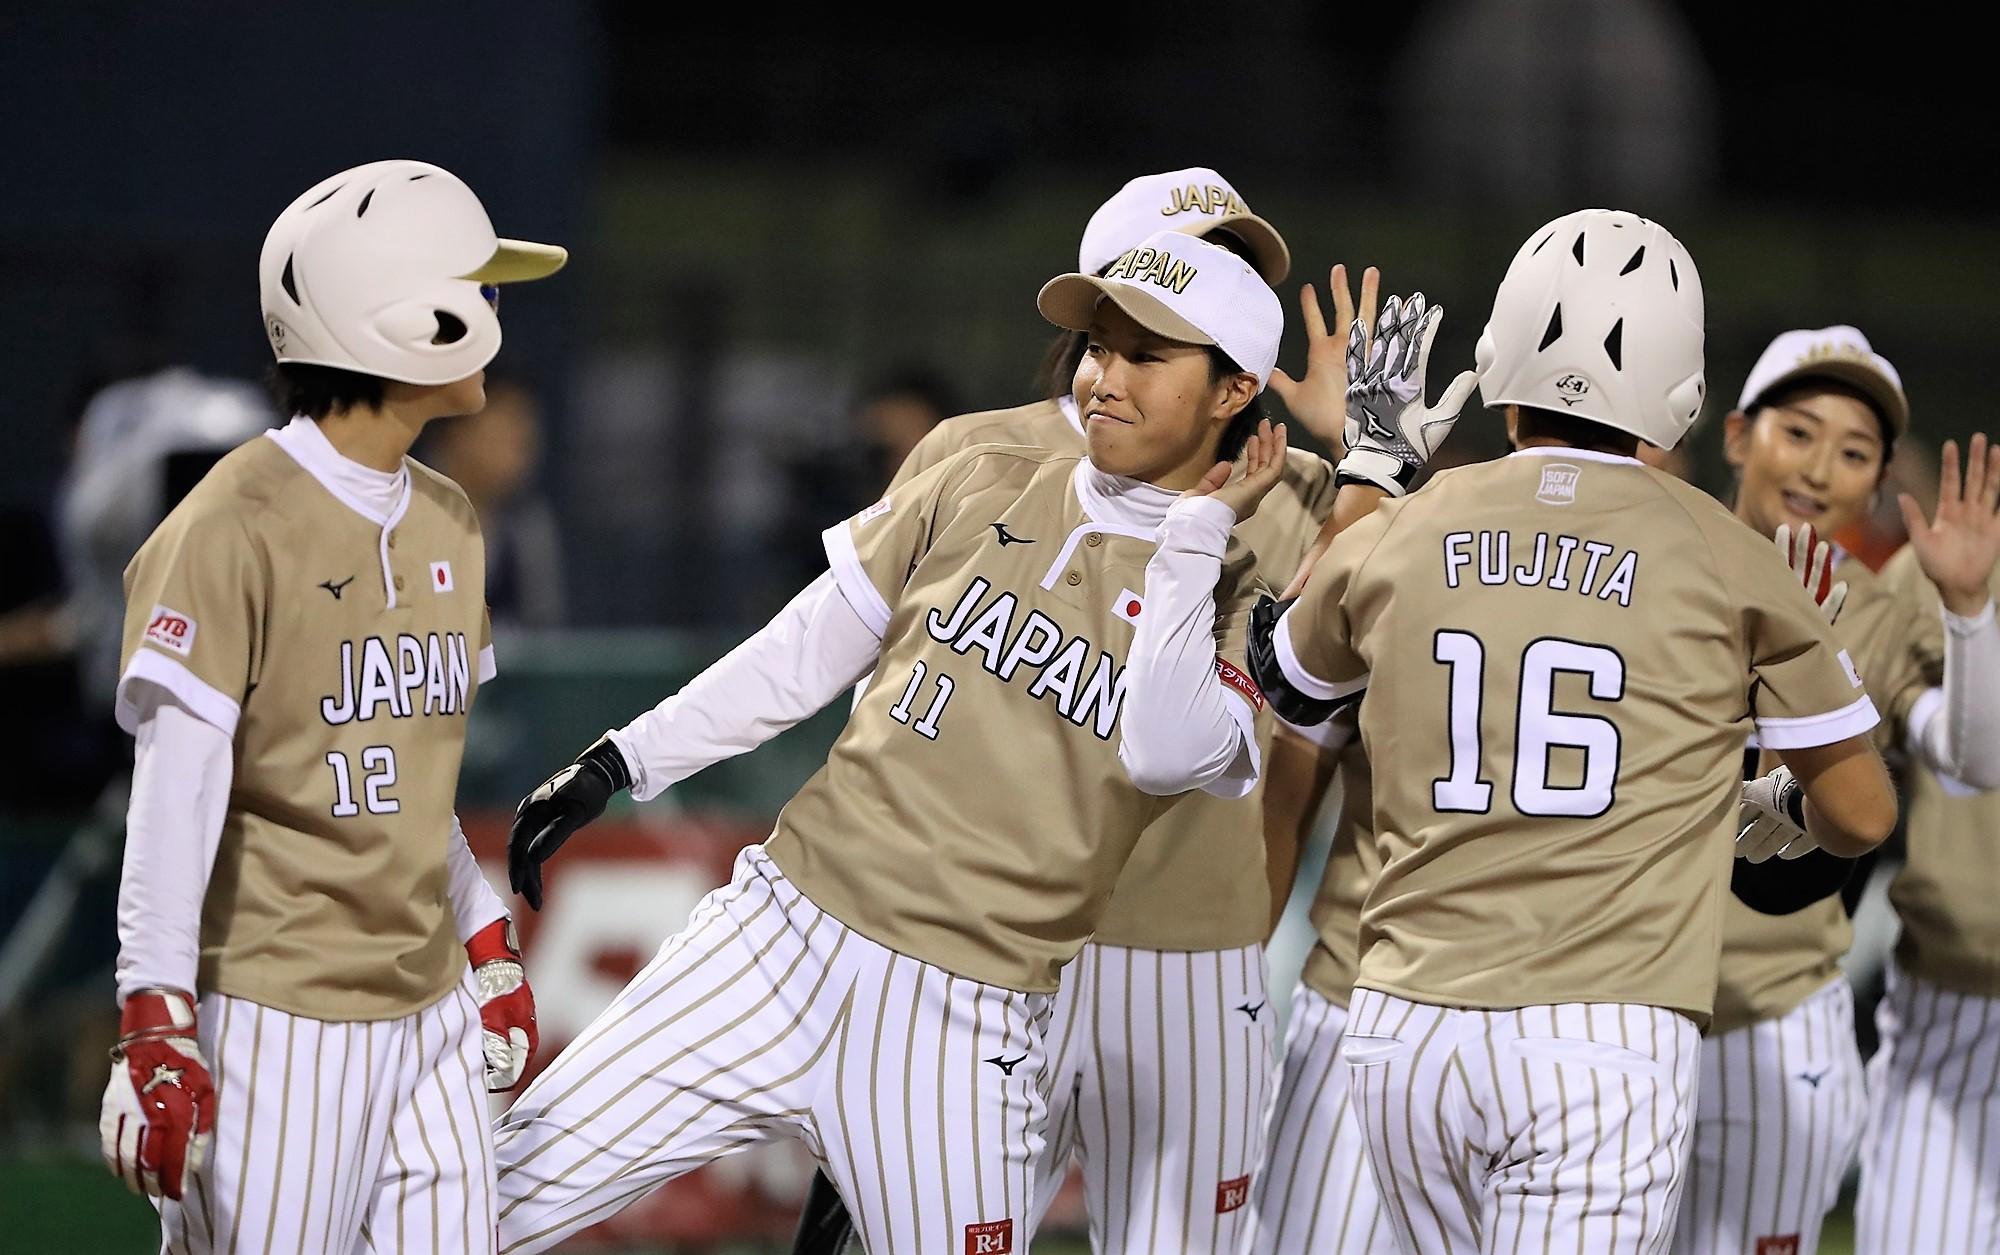 Japan has won 5 straight now